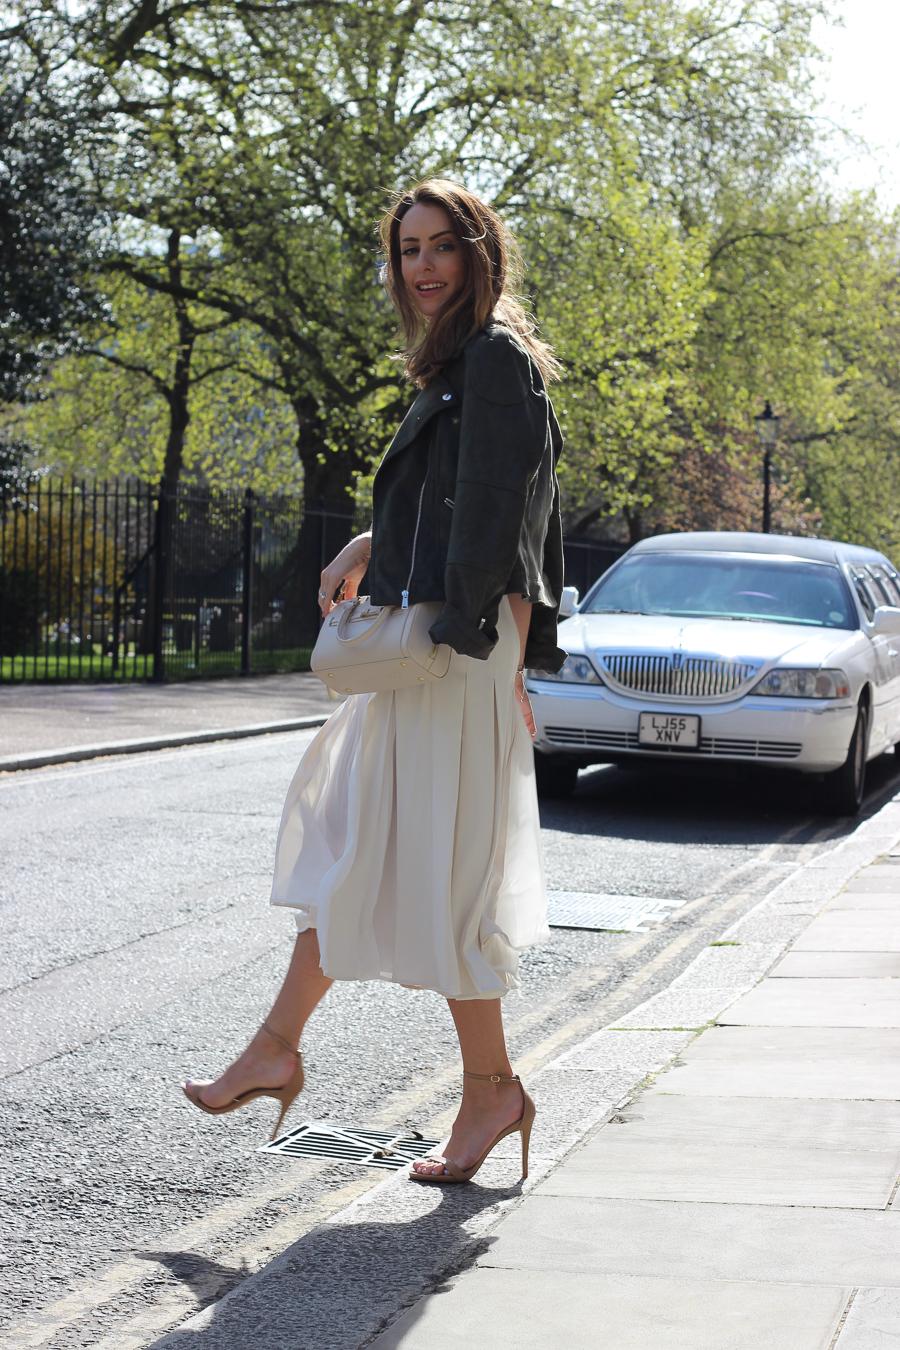 Folli Follie UK - Clutch and carry on - uk travel blogger, uk fashion blogger, london street style, sabrina chakici tblogger-34